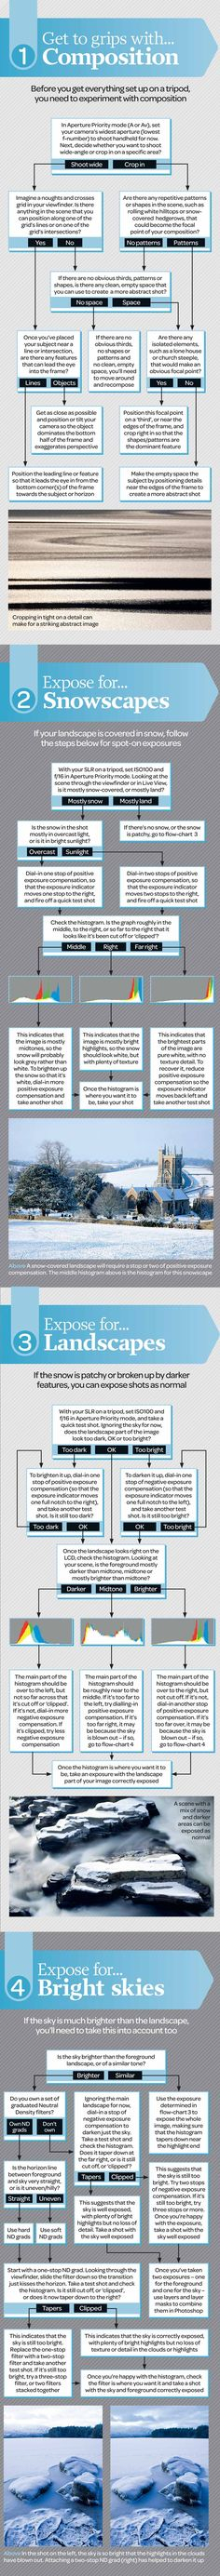 Fotografías en invierno #infografia #infographic #design